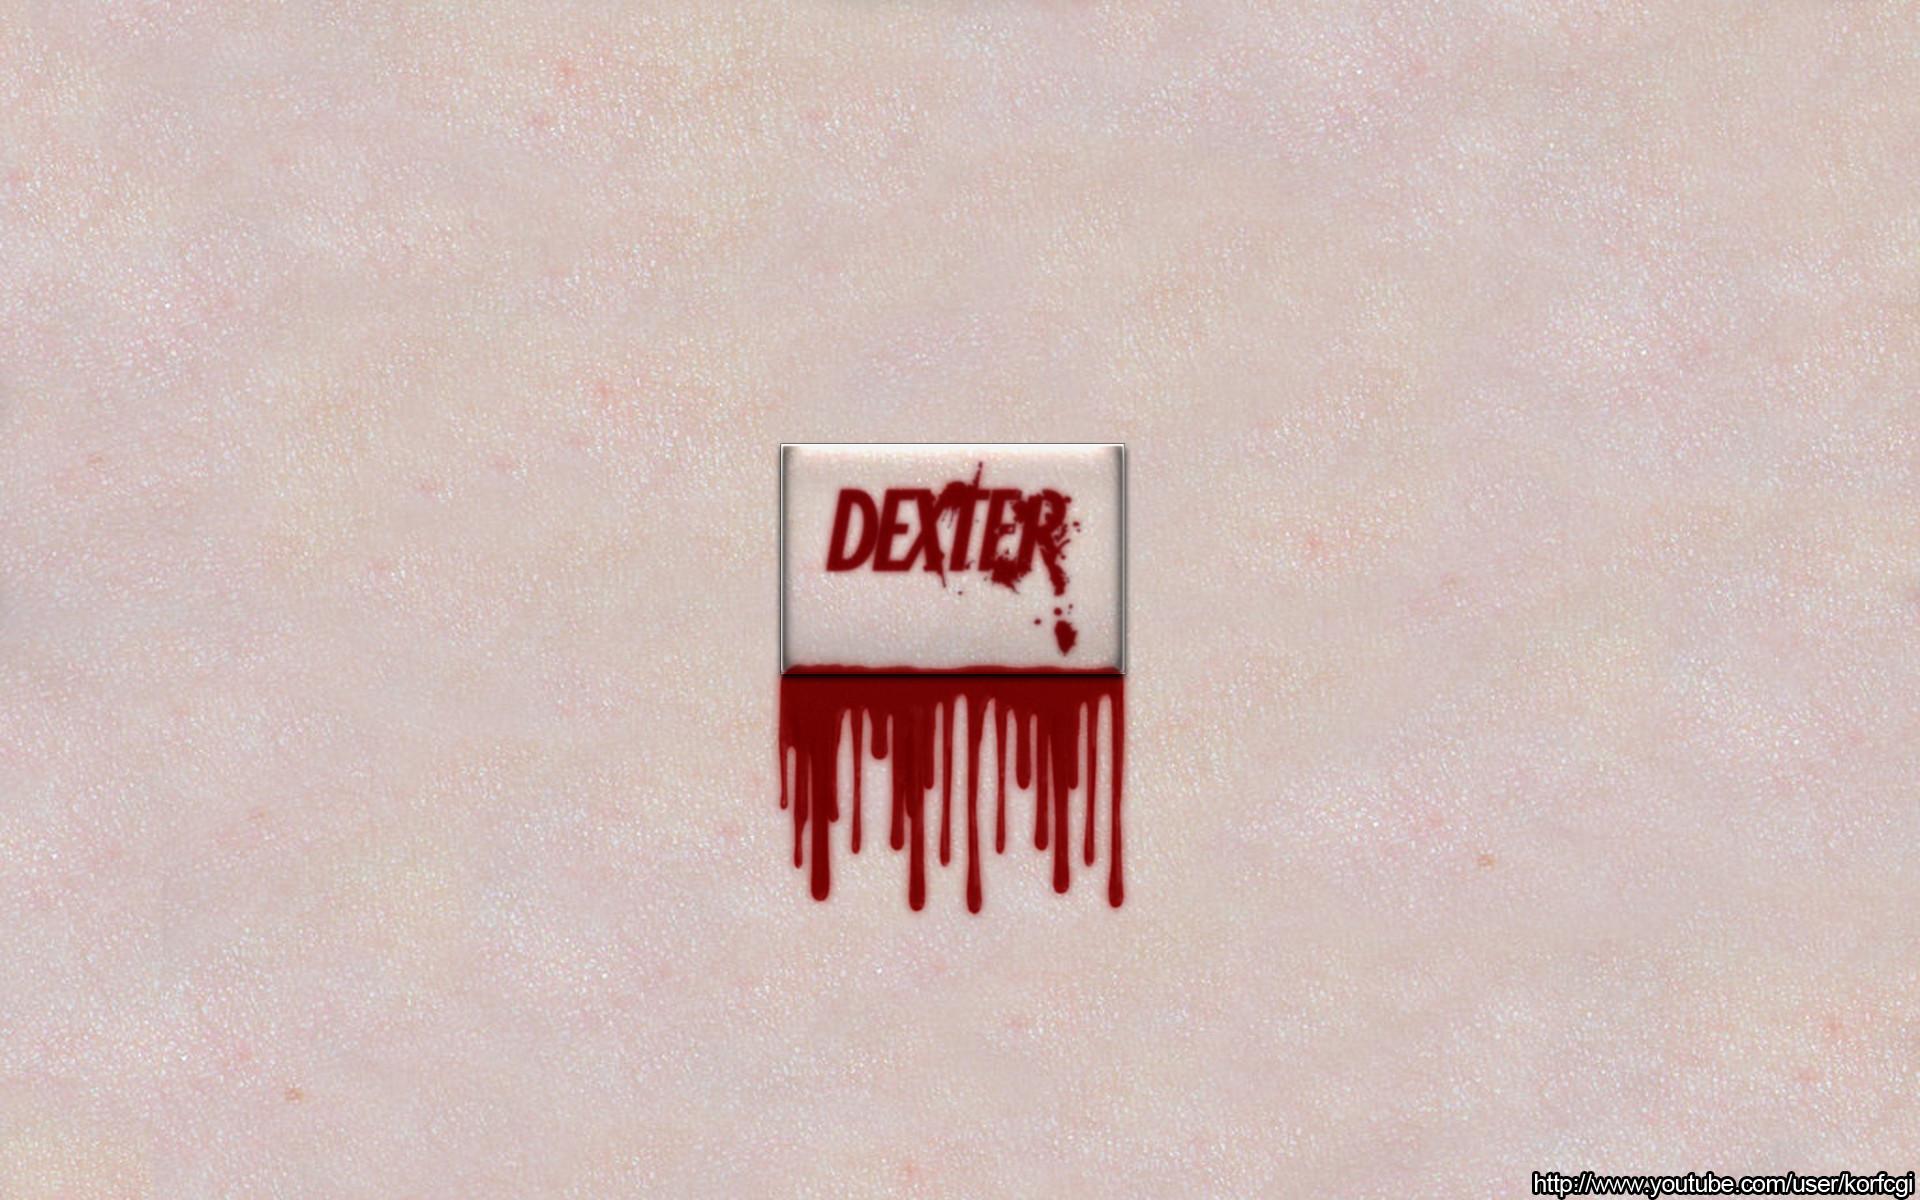 Dexter wallpaper by KorfCGI Dexter wallpaper by KorfCGI